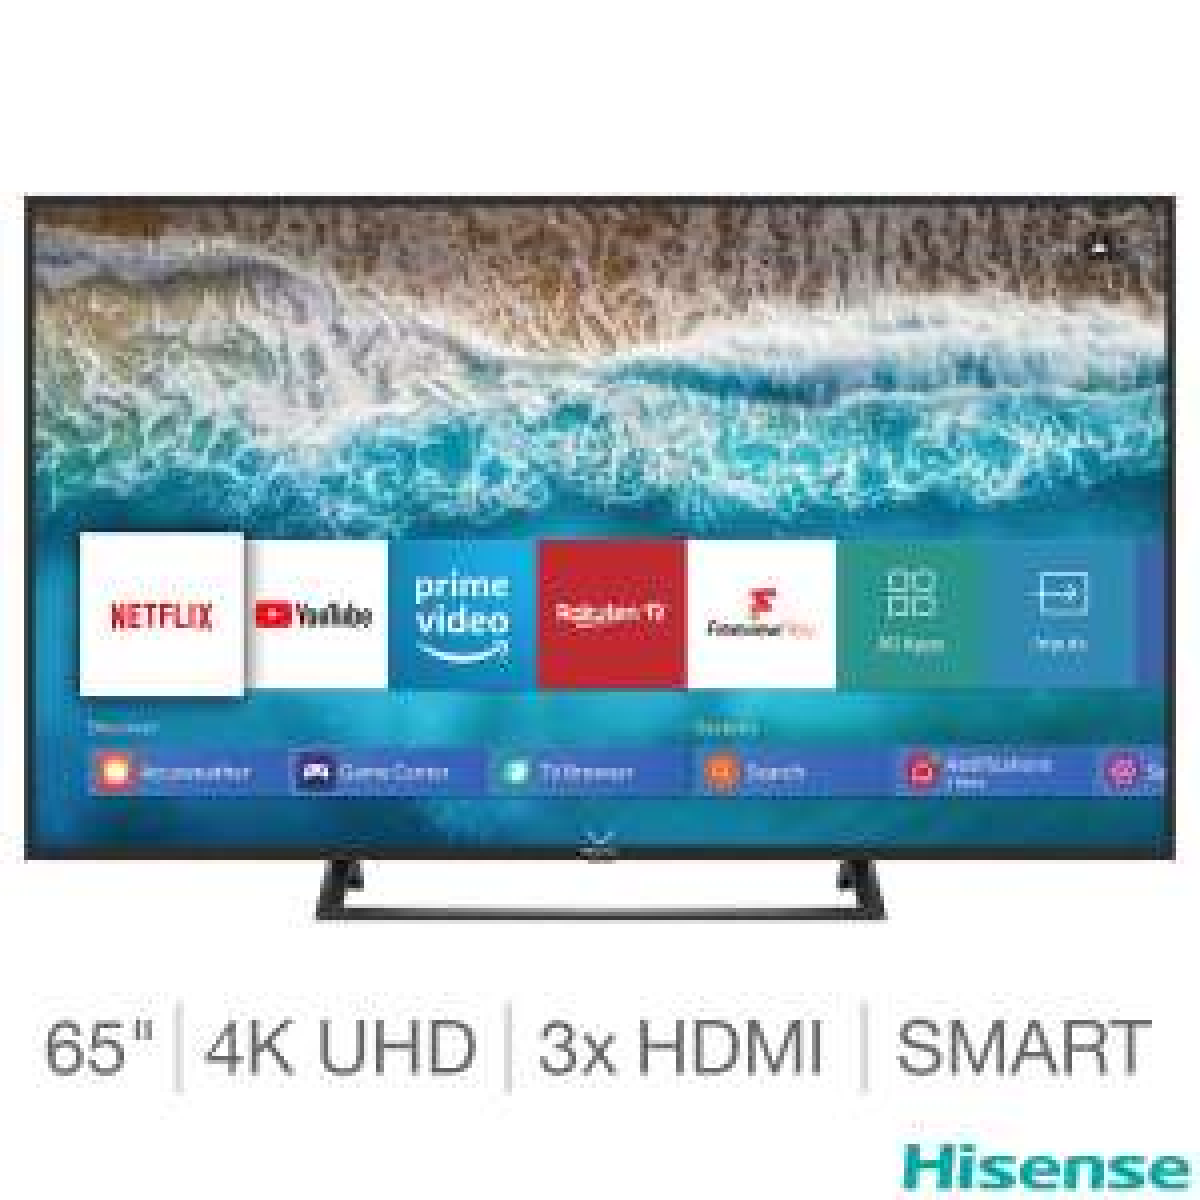 Hisense H65B7300UK 65 Inch 4K Ultra HD Smart TV £419.98 @ Costco in-store